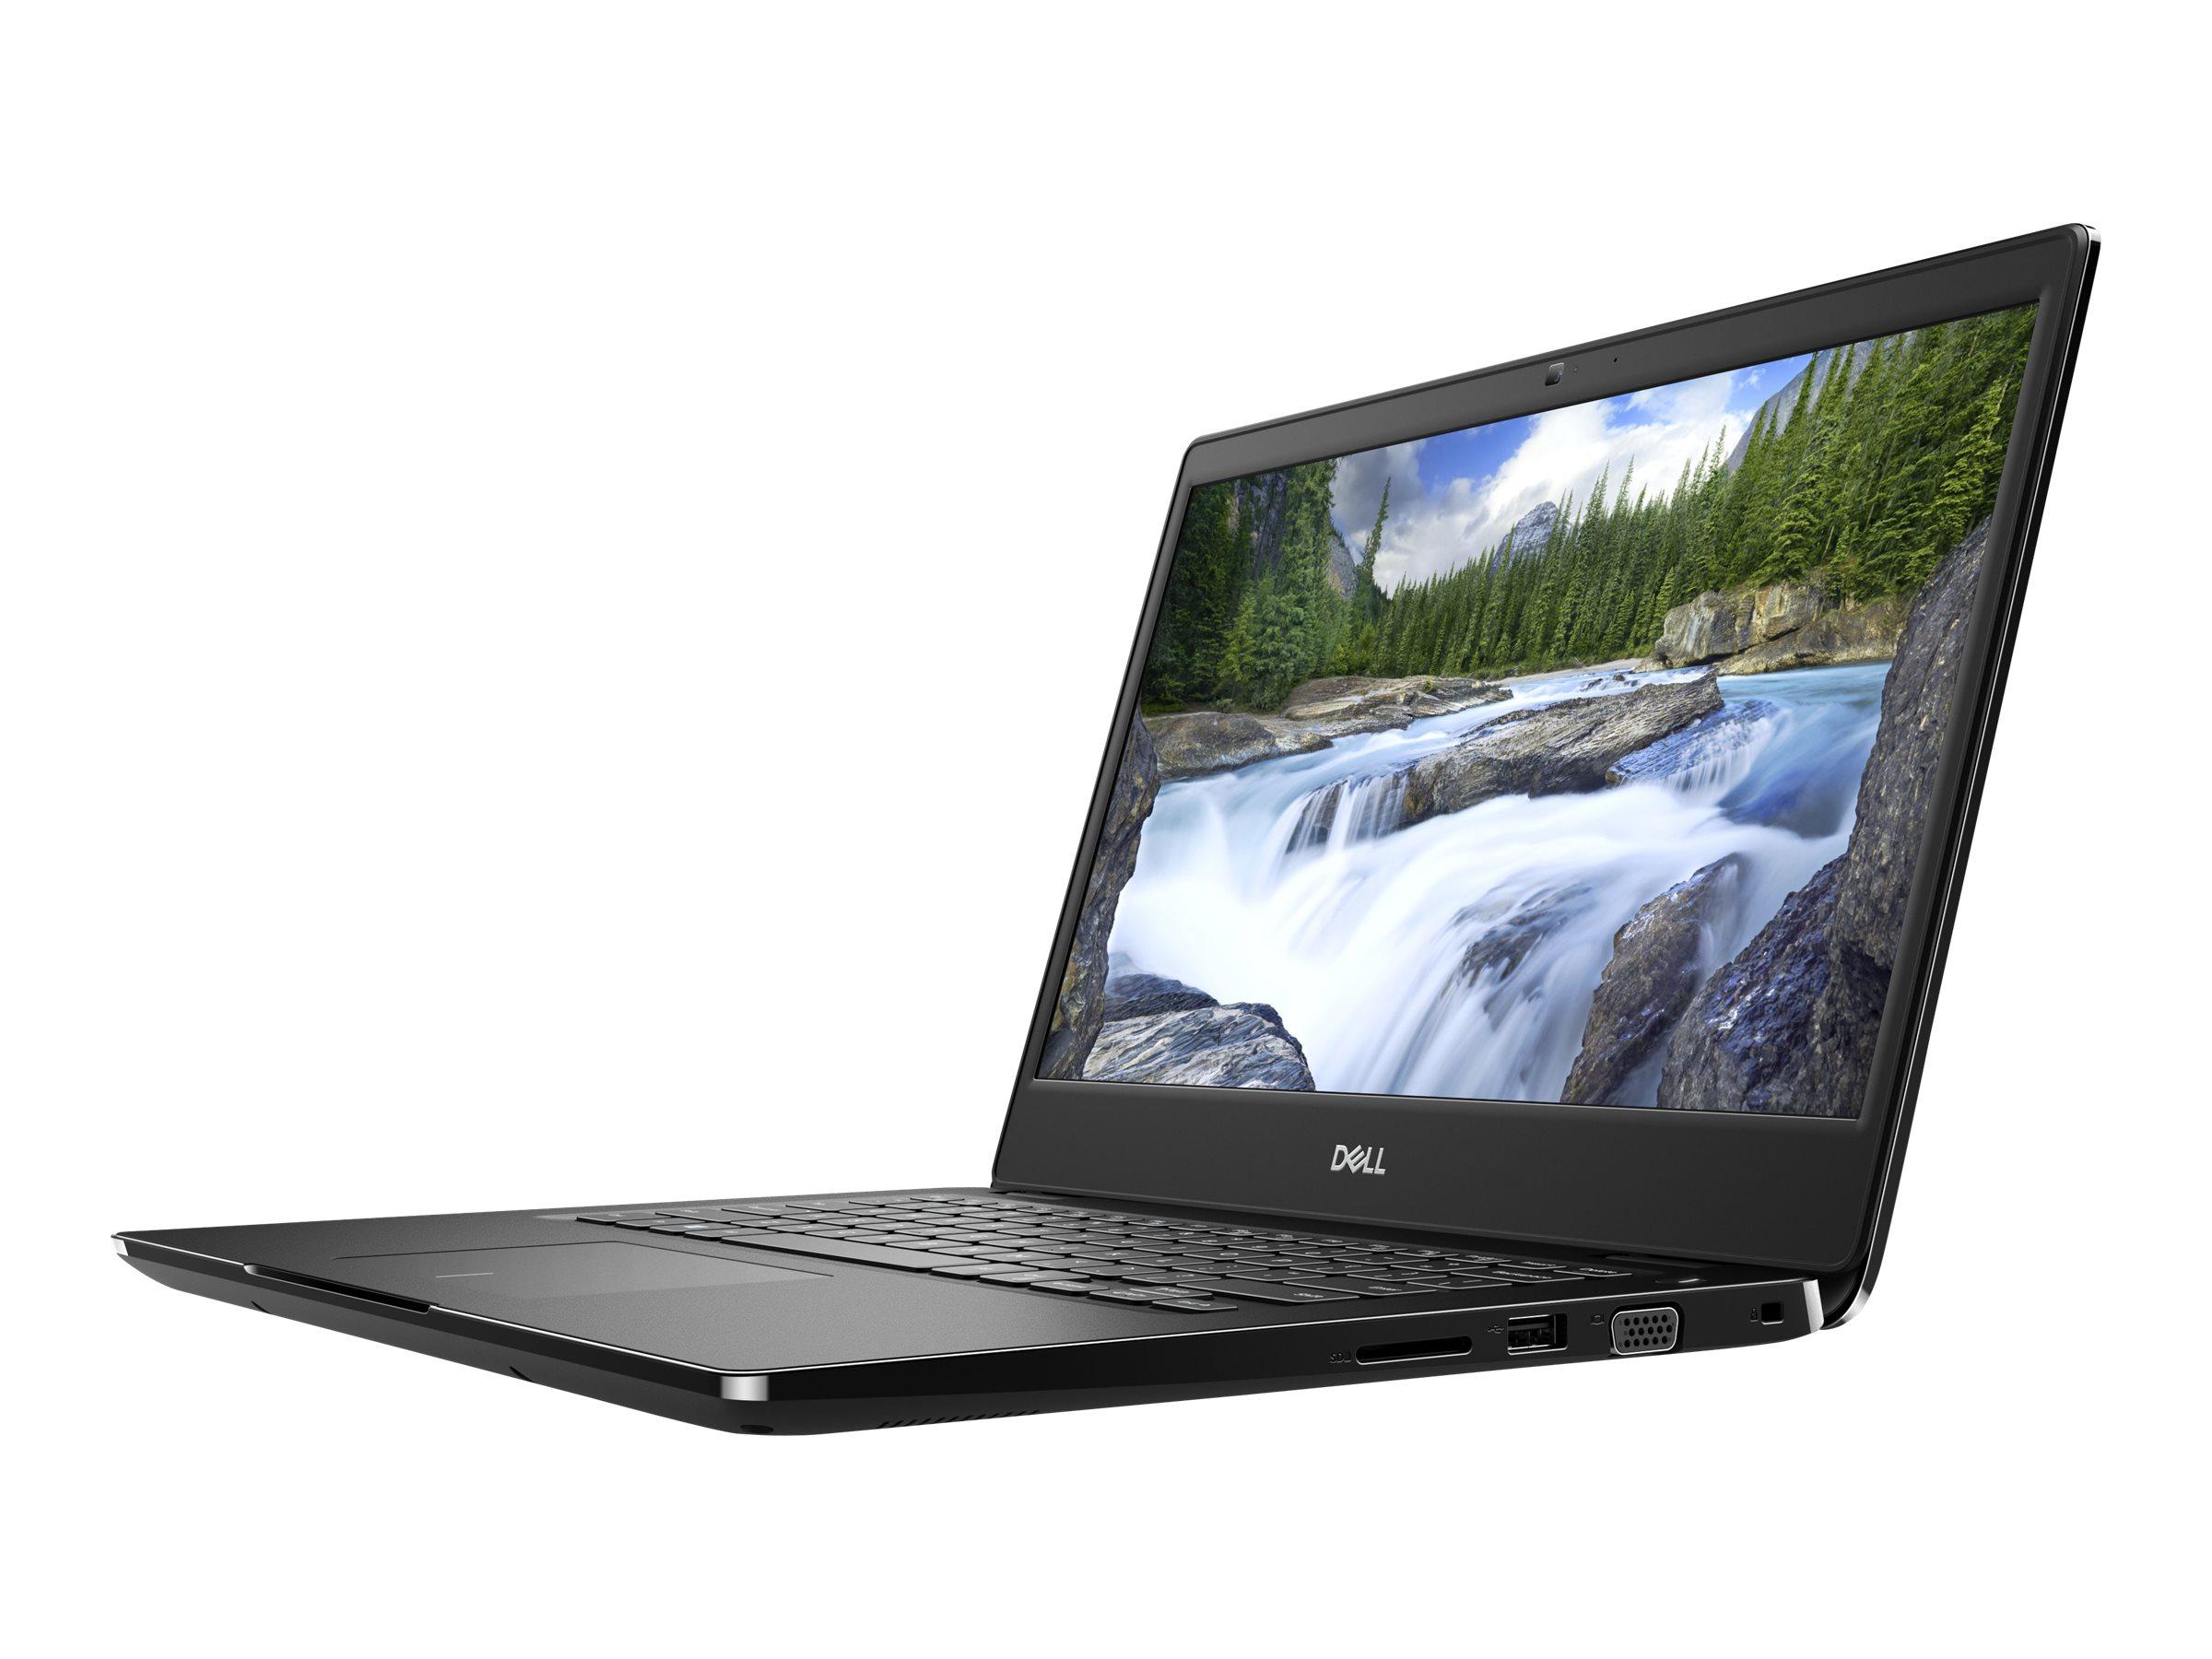 "Dell Latitude 3400 - Core i3 8145U / 2.1 GHz - Win 10 Pro 64-Bit - 8 GB RAM - 256 GB SSD NVMe, Class 35 - 35.6 cm (14"")"